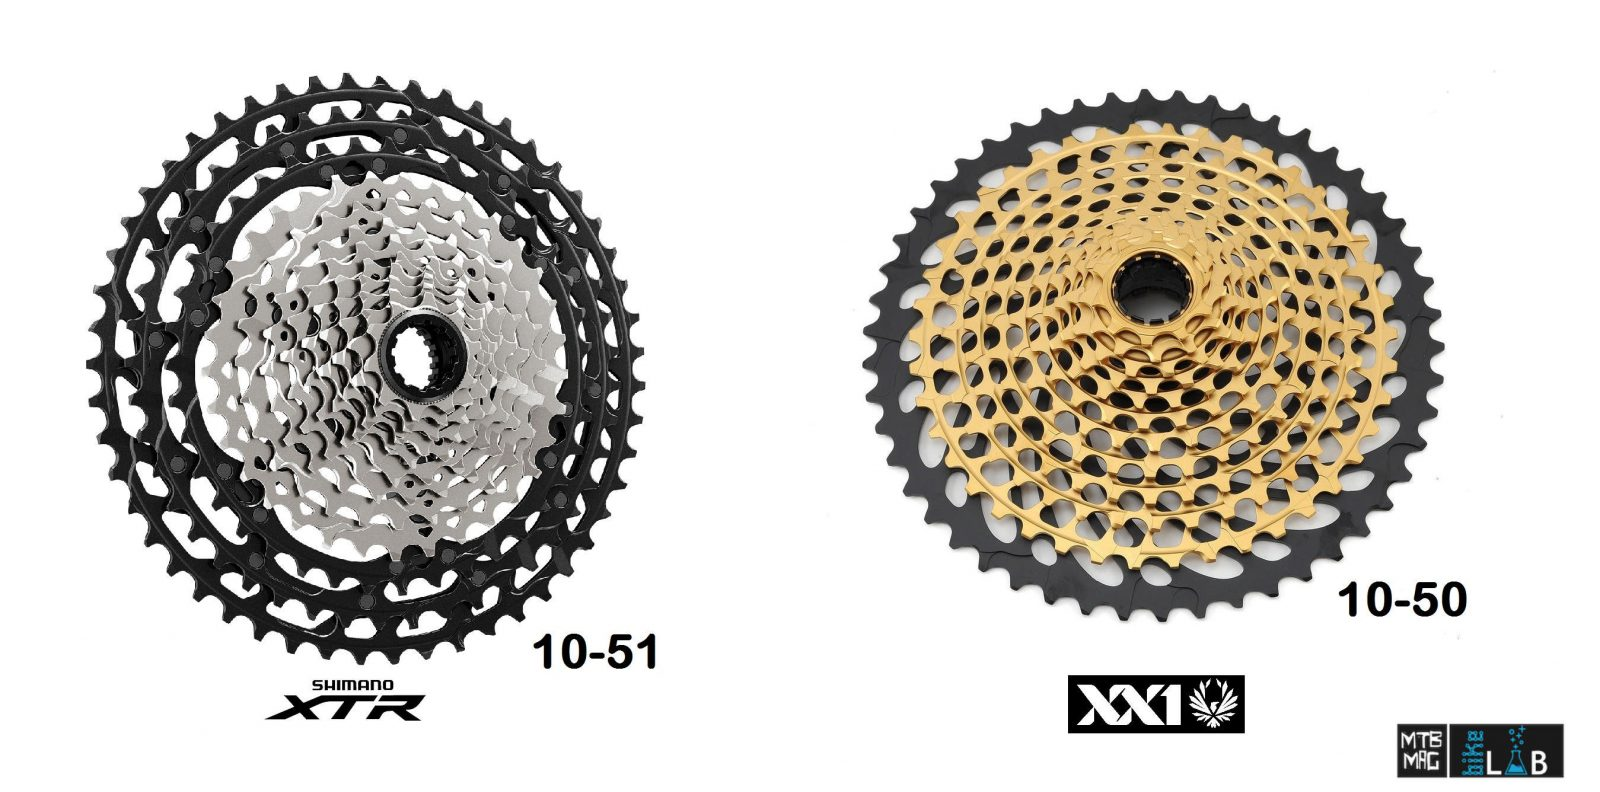 MTB-MAG COM - Mountain Bike Magazine | XTR 12 Speed vs  SRAM